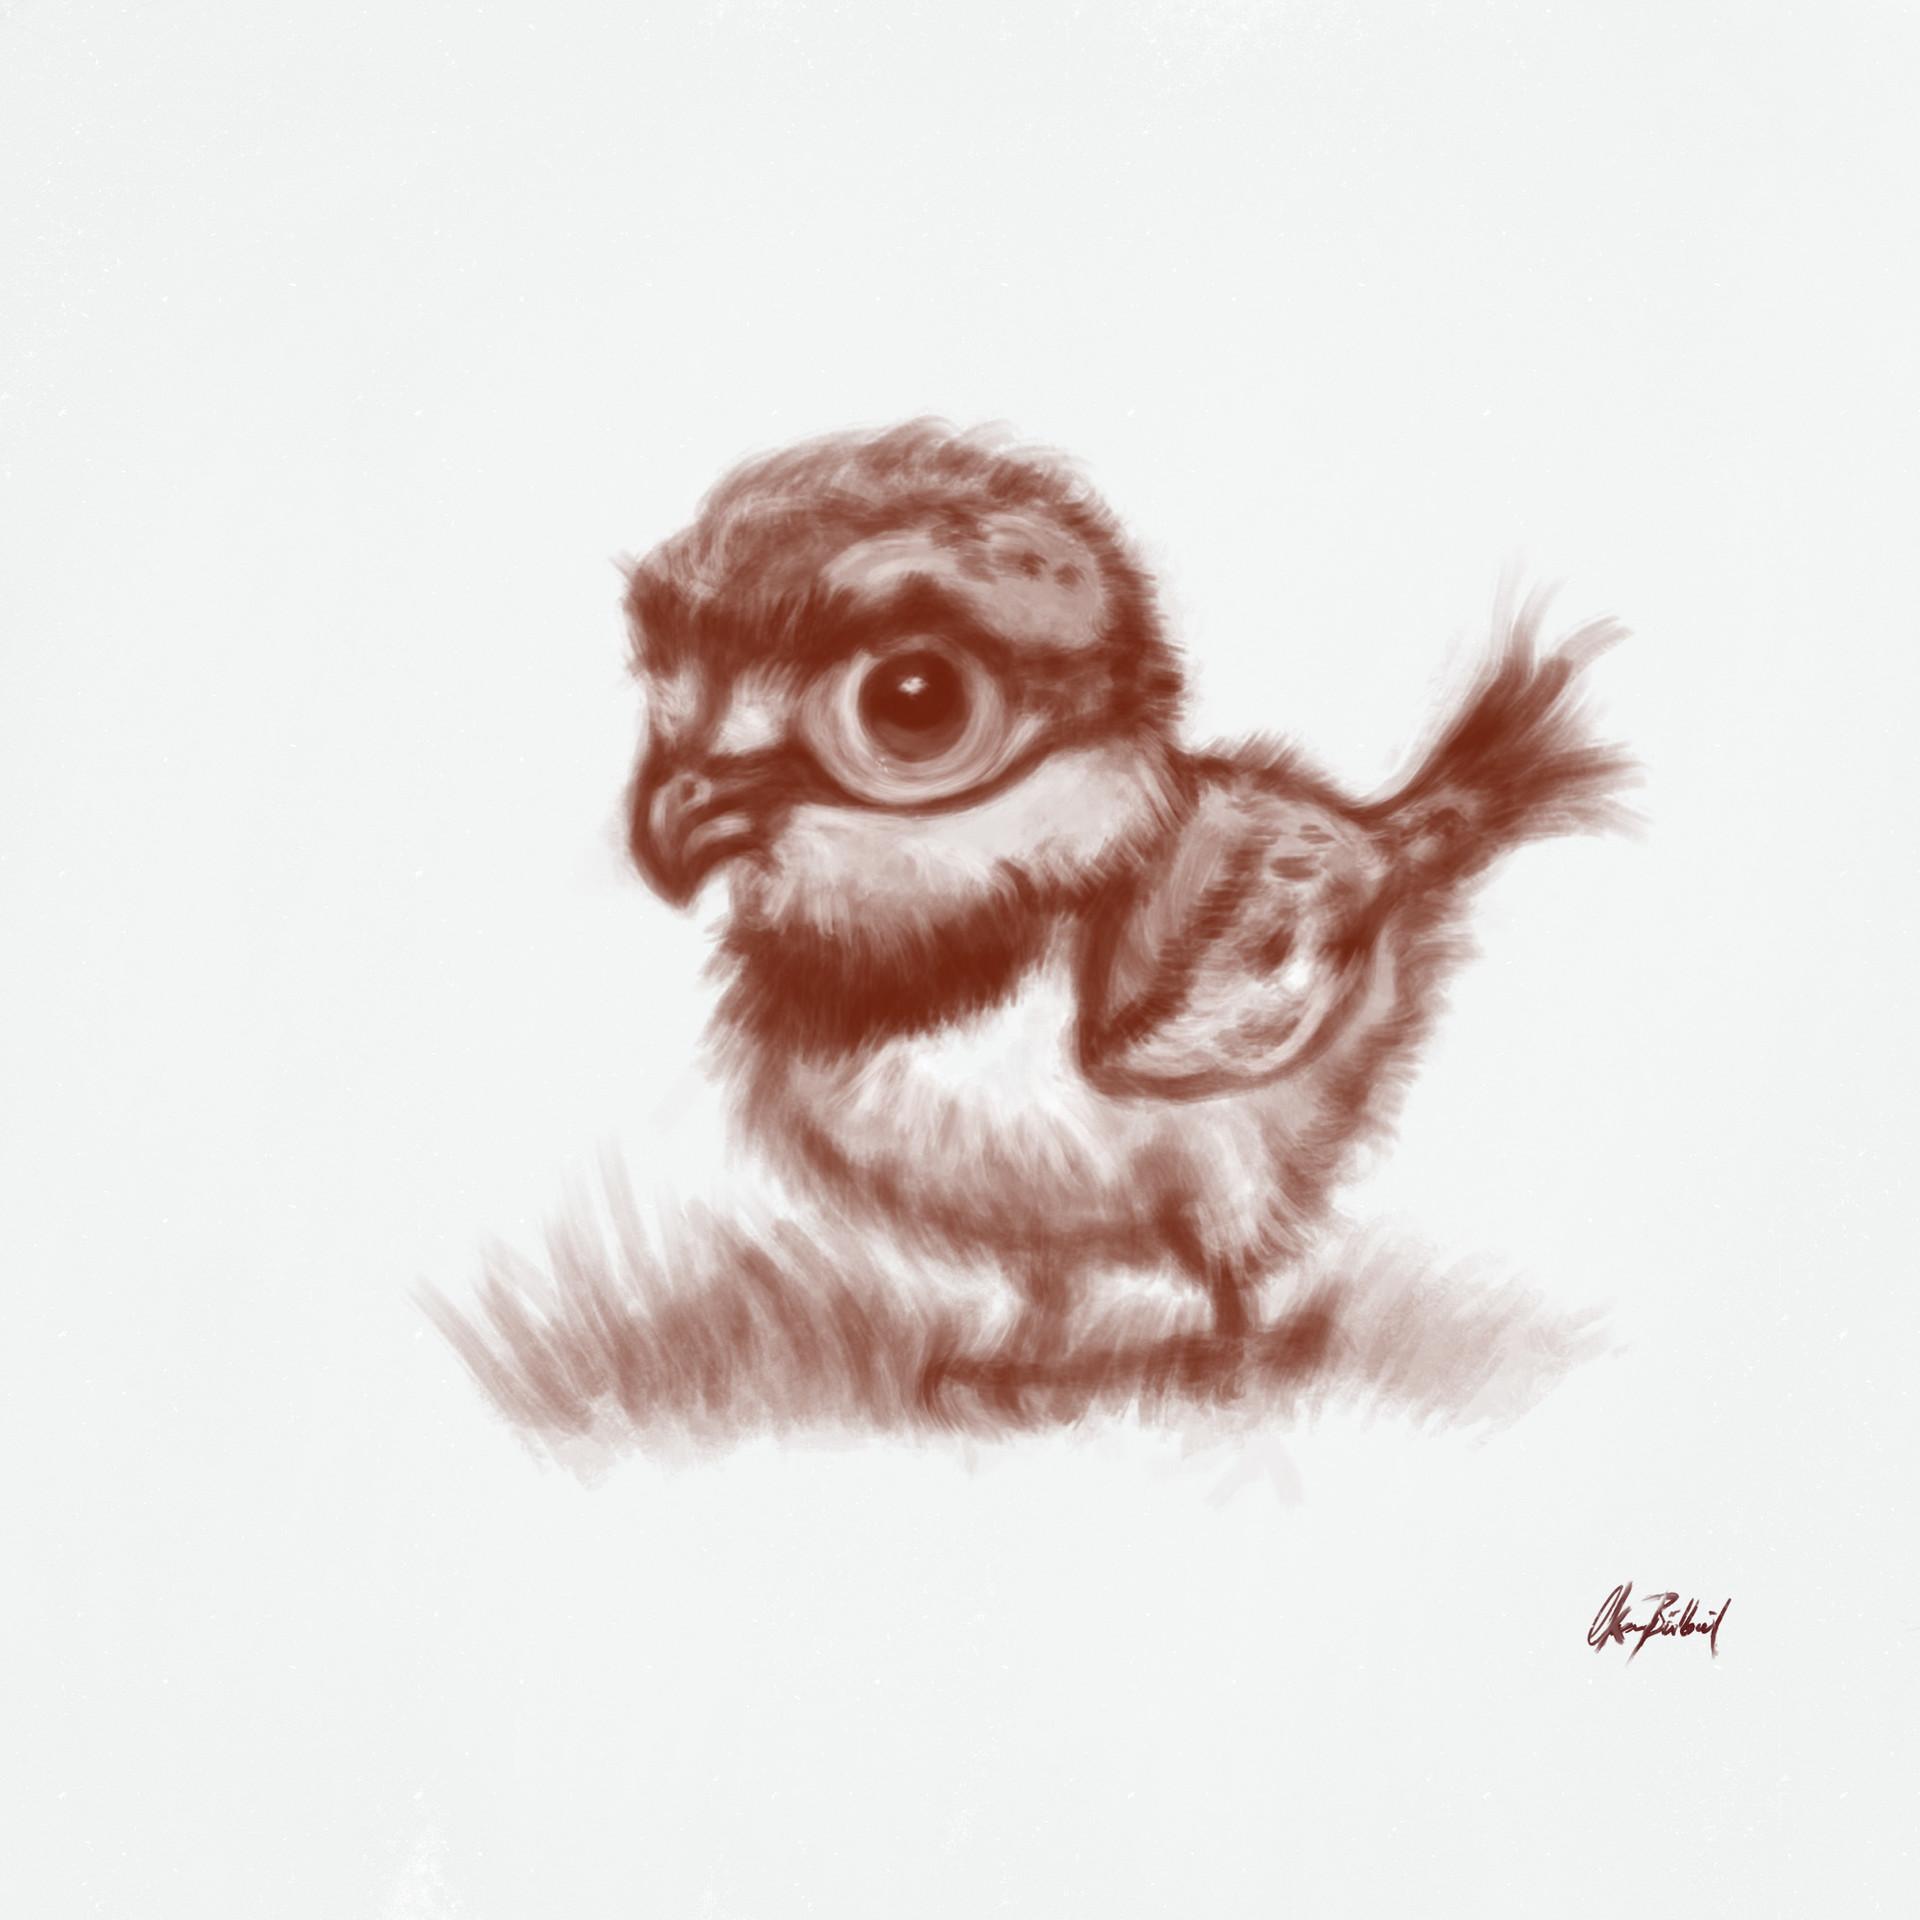 Okan bulbul fluffybird01